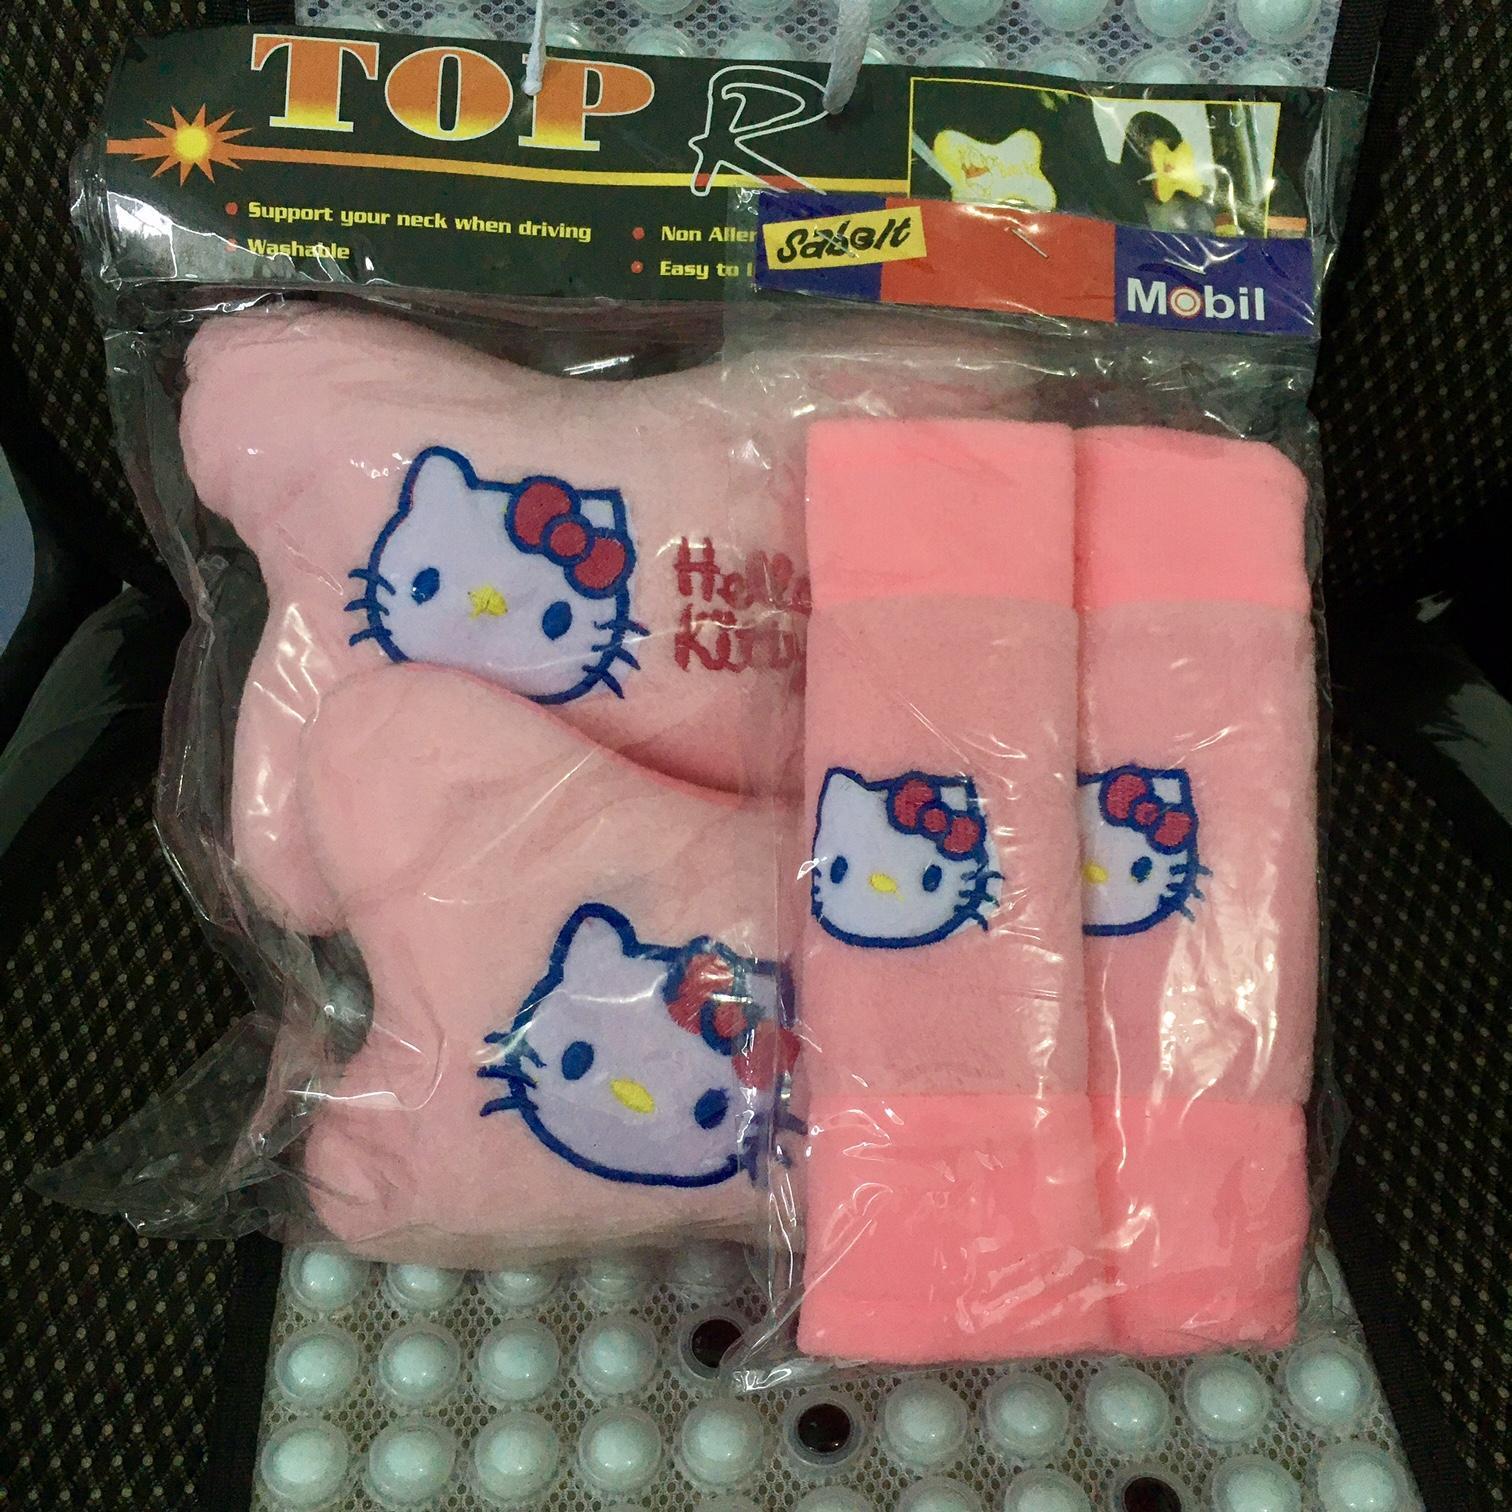 Bantal set 2in1 mobil murah motif hello kitty warna merah muda / Aksesoris interior bantal mobil 2 in 1 unik lucu model hellokitty warna soft pink / hellokitty stuff / sarung bantal lucu UNIVERSAL